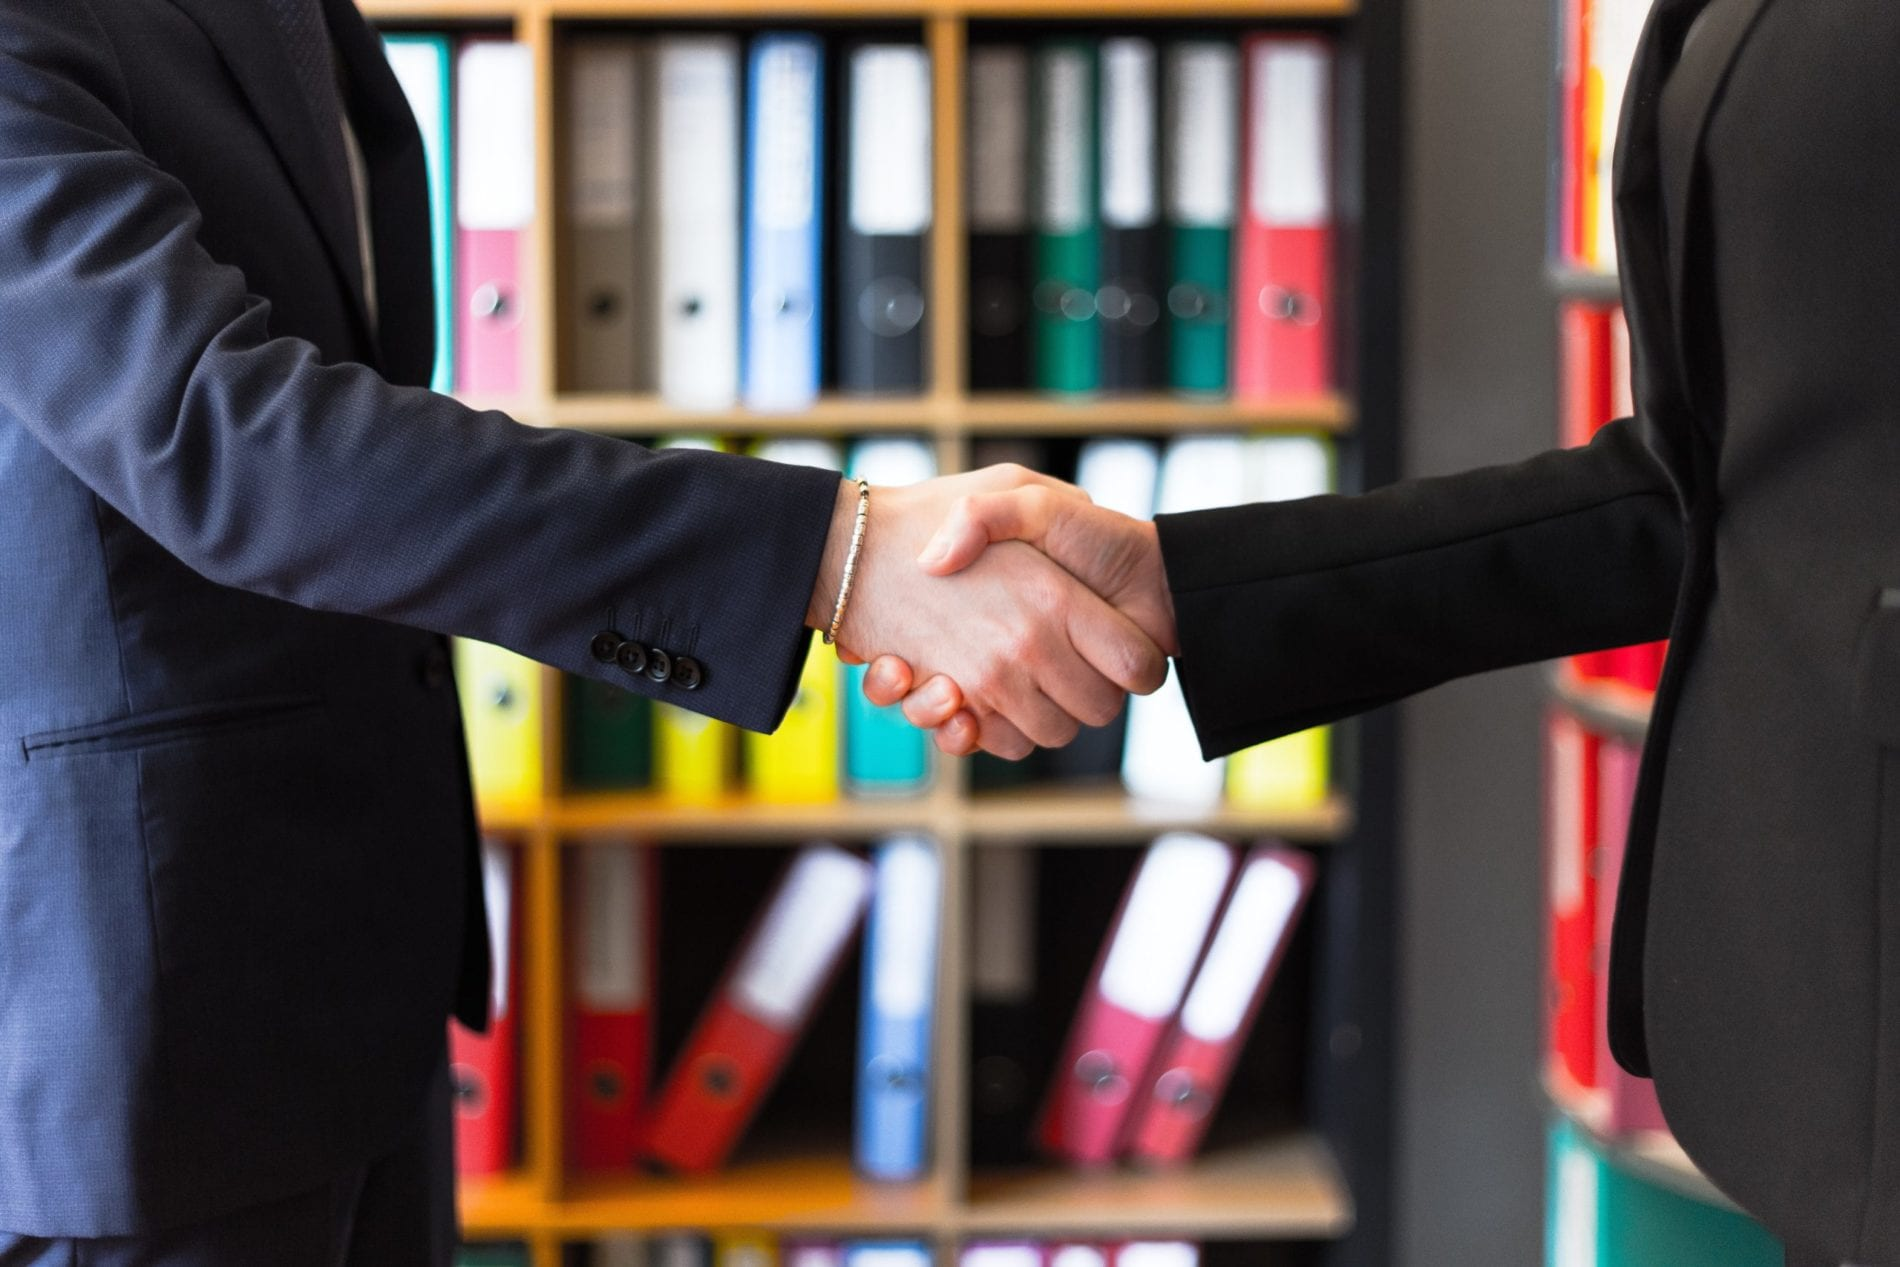 uścisk dłoni - umowa